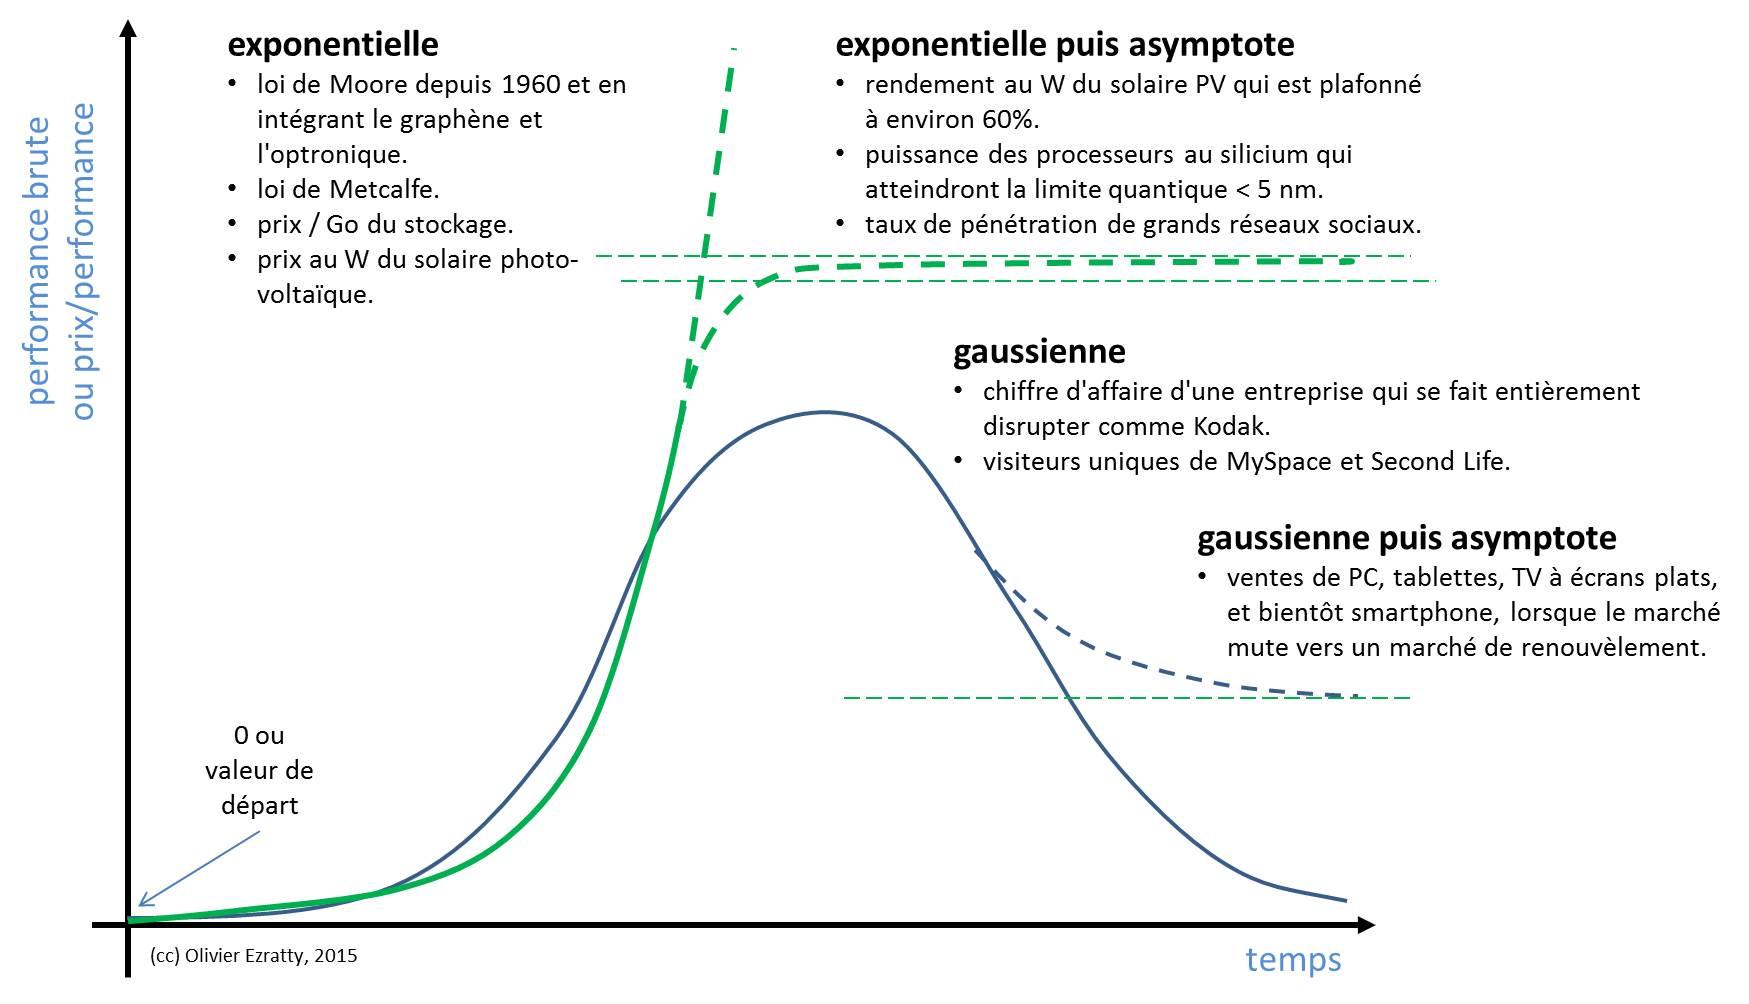 Exponentielles Gaussiennes et Asymptotes